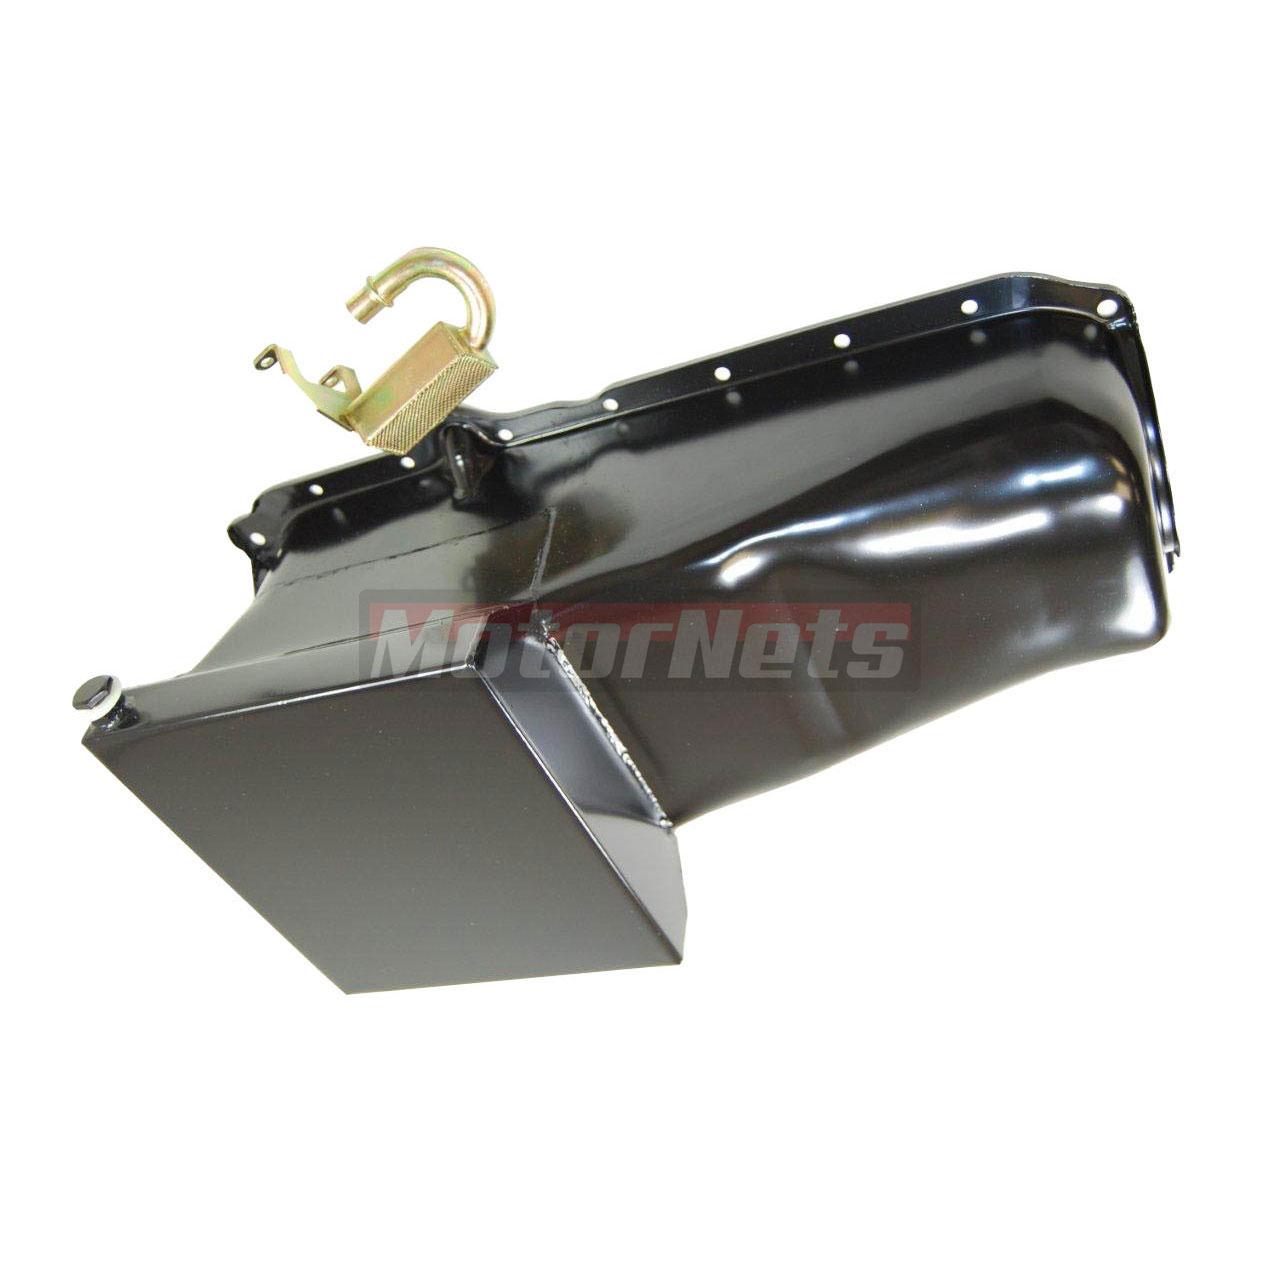 Chevy Small Block Black 86-UP 283 305 327 350 400 Drag